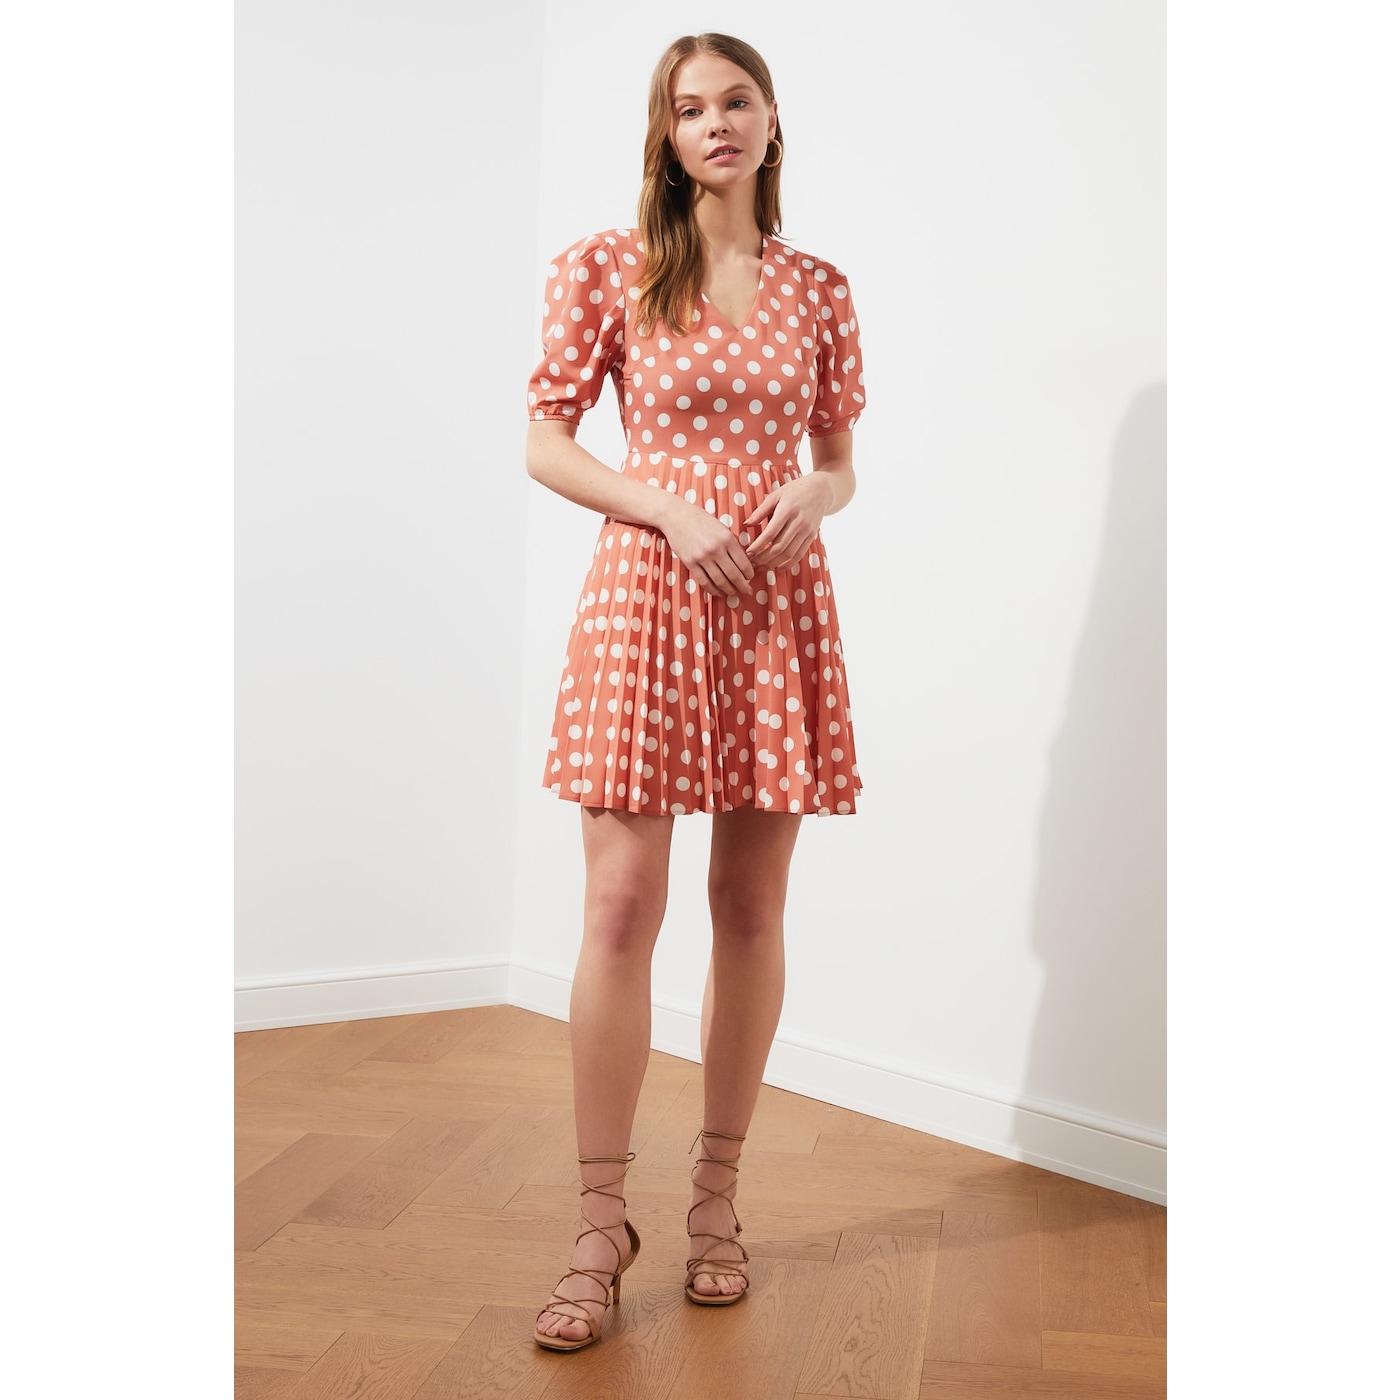 Trendyol Tile Polkalic Pleat Dress dámské 42